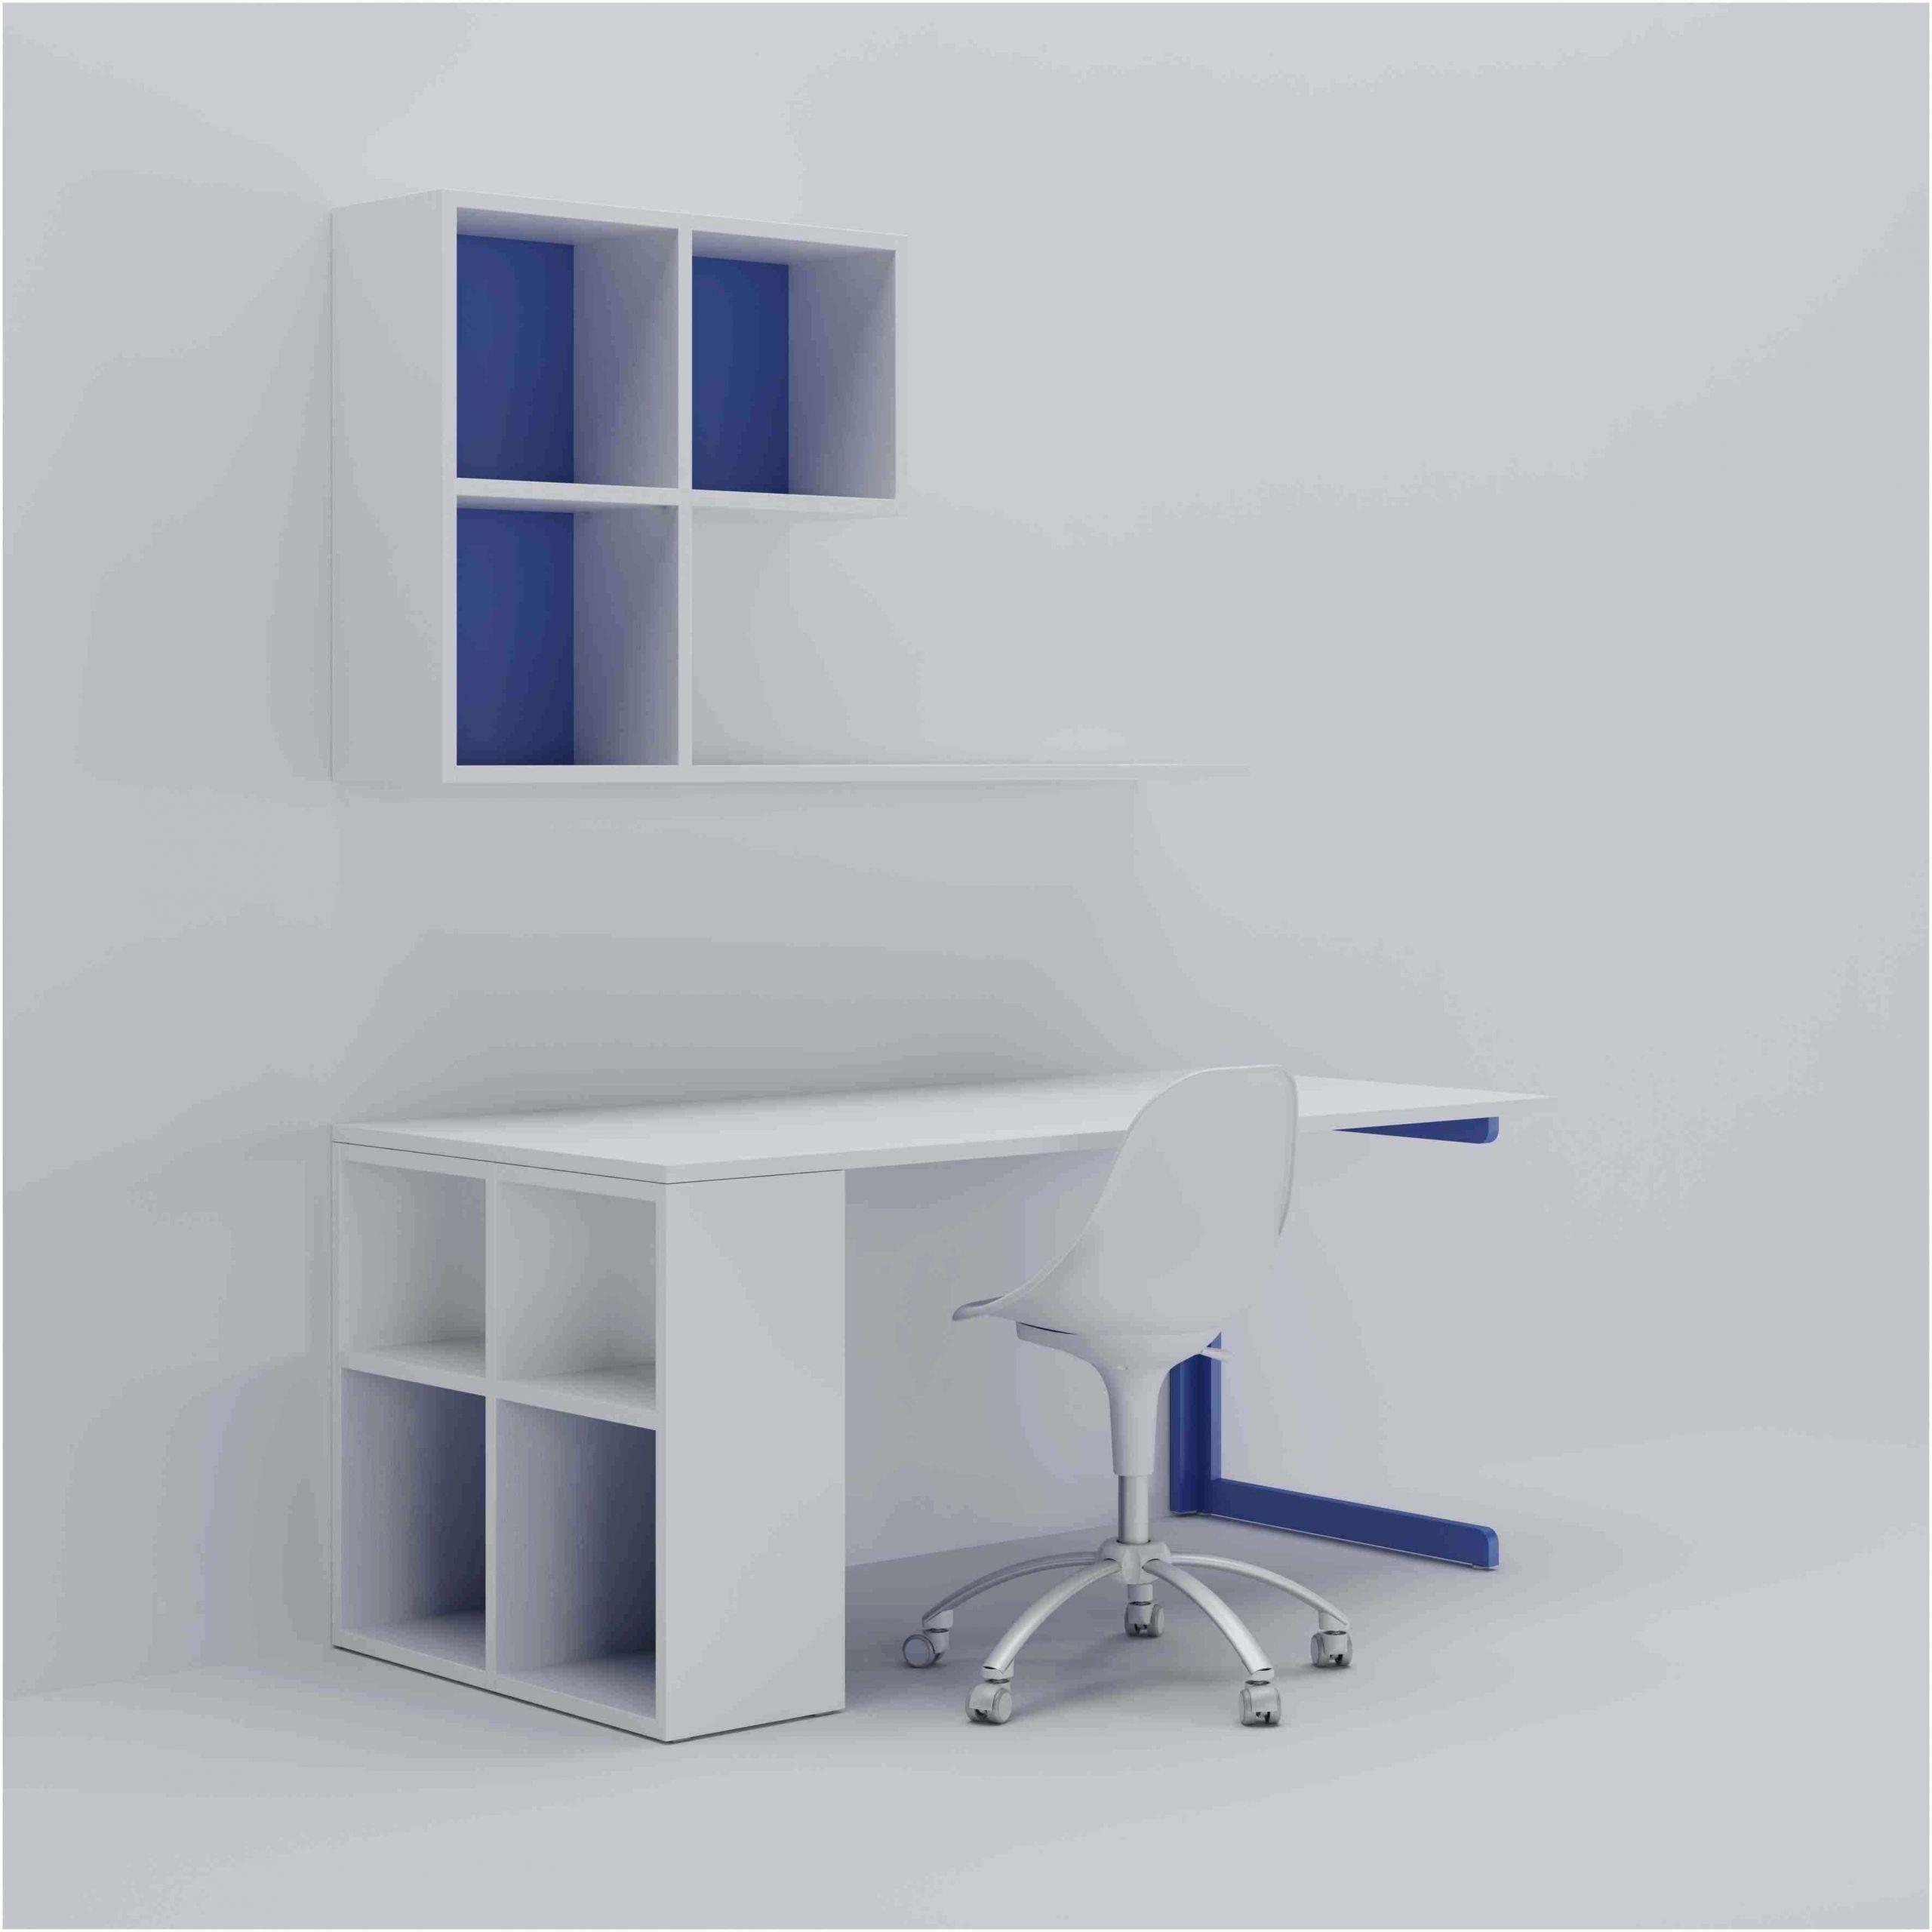 magasin de meuble annemasse luxe lesmeubles idee bureau ikea beau meubles besta meuble blanc 0d of magasin de meuble annemasse 1